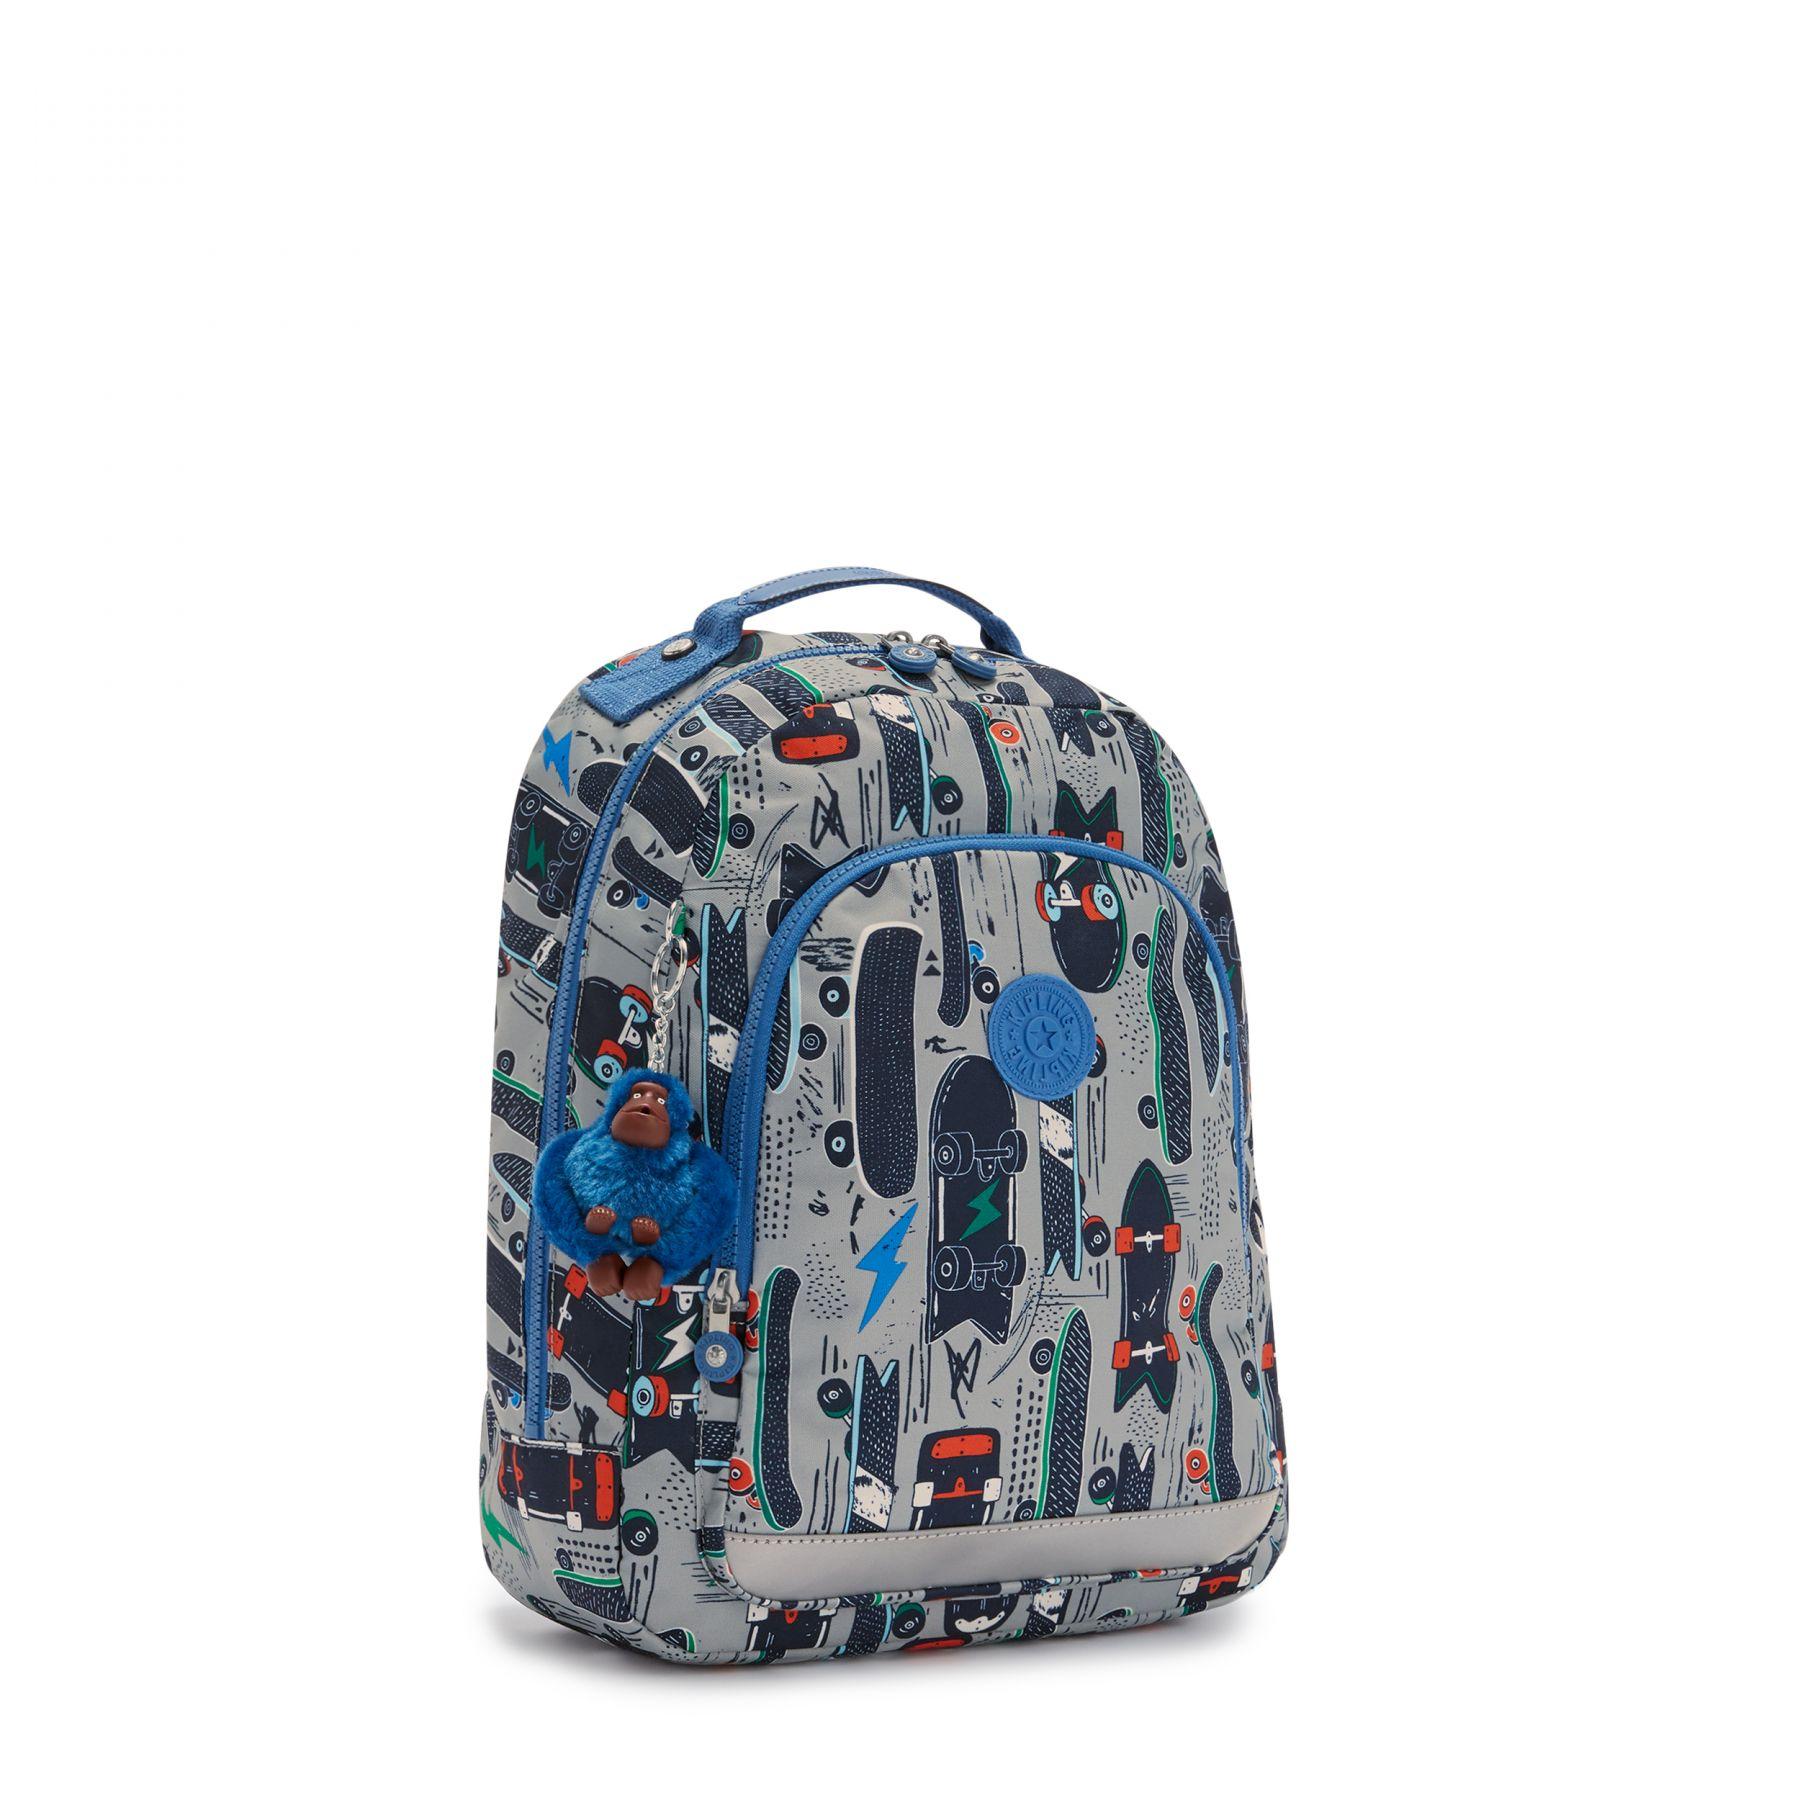 CLASS ROOM S SCHOOL BAGS by Kipling